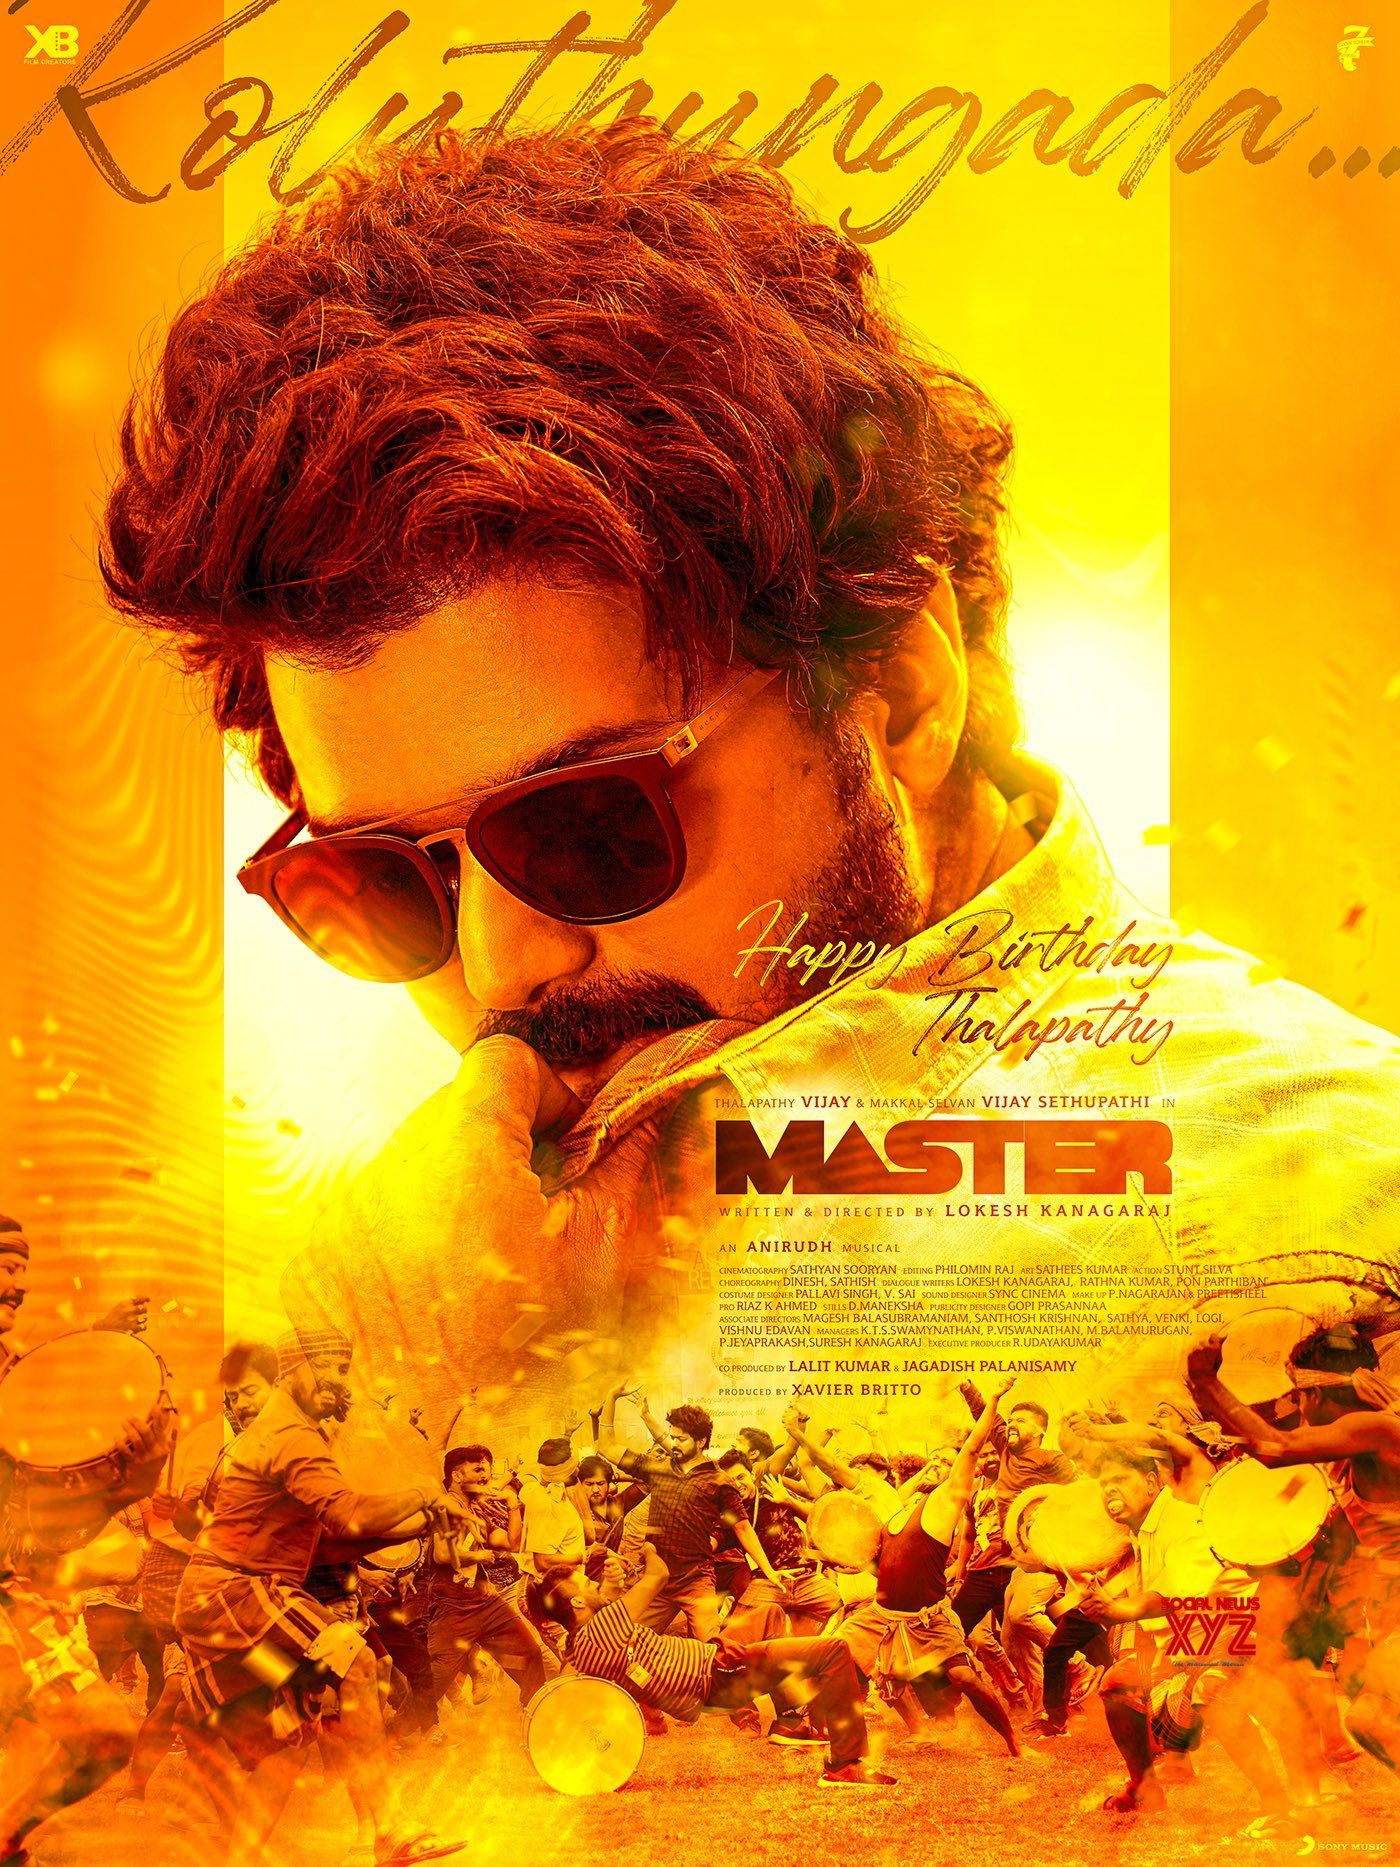 Thalapathy Vijay Birthday 2020 Special Poster From Master Movie Team Social News Xyz Vijay Actor Actors Next Film